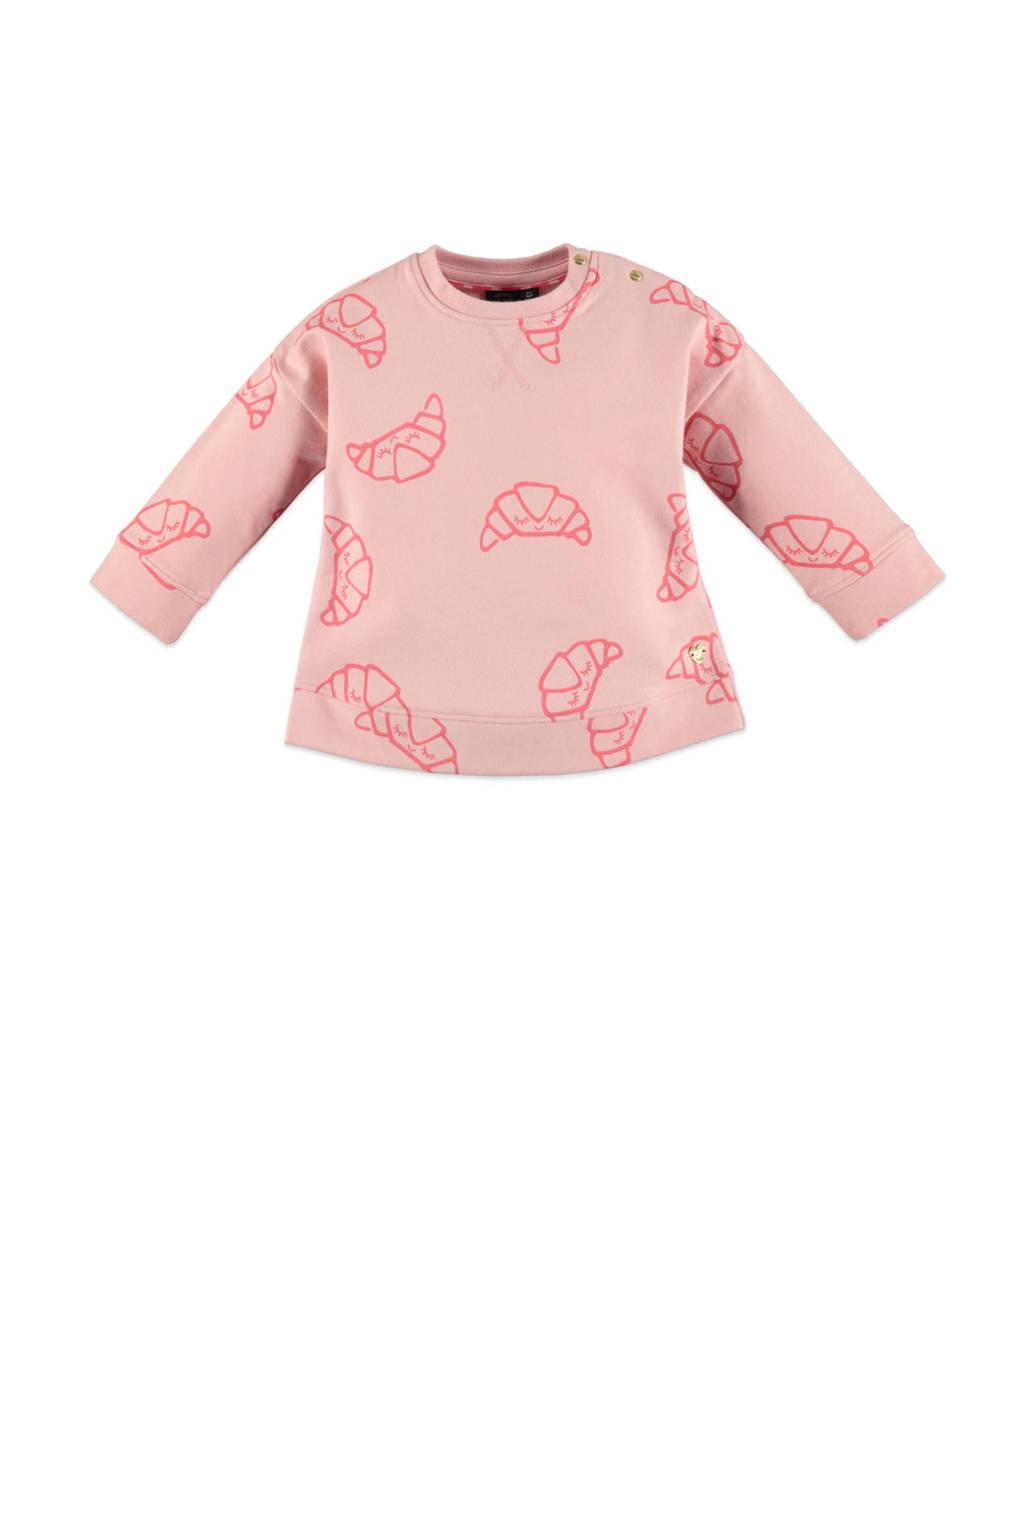 Babyface sweater met all over print lichtroze/roze, Lichtroze/roze